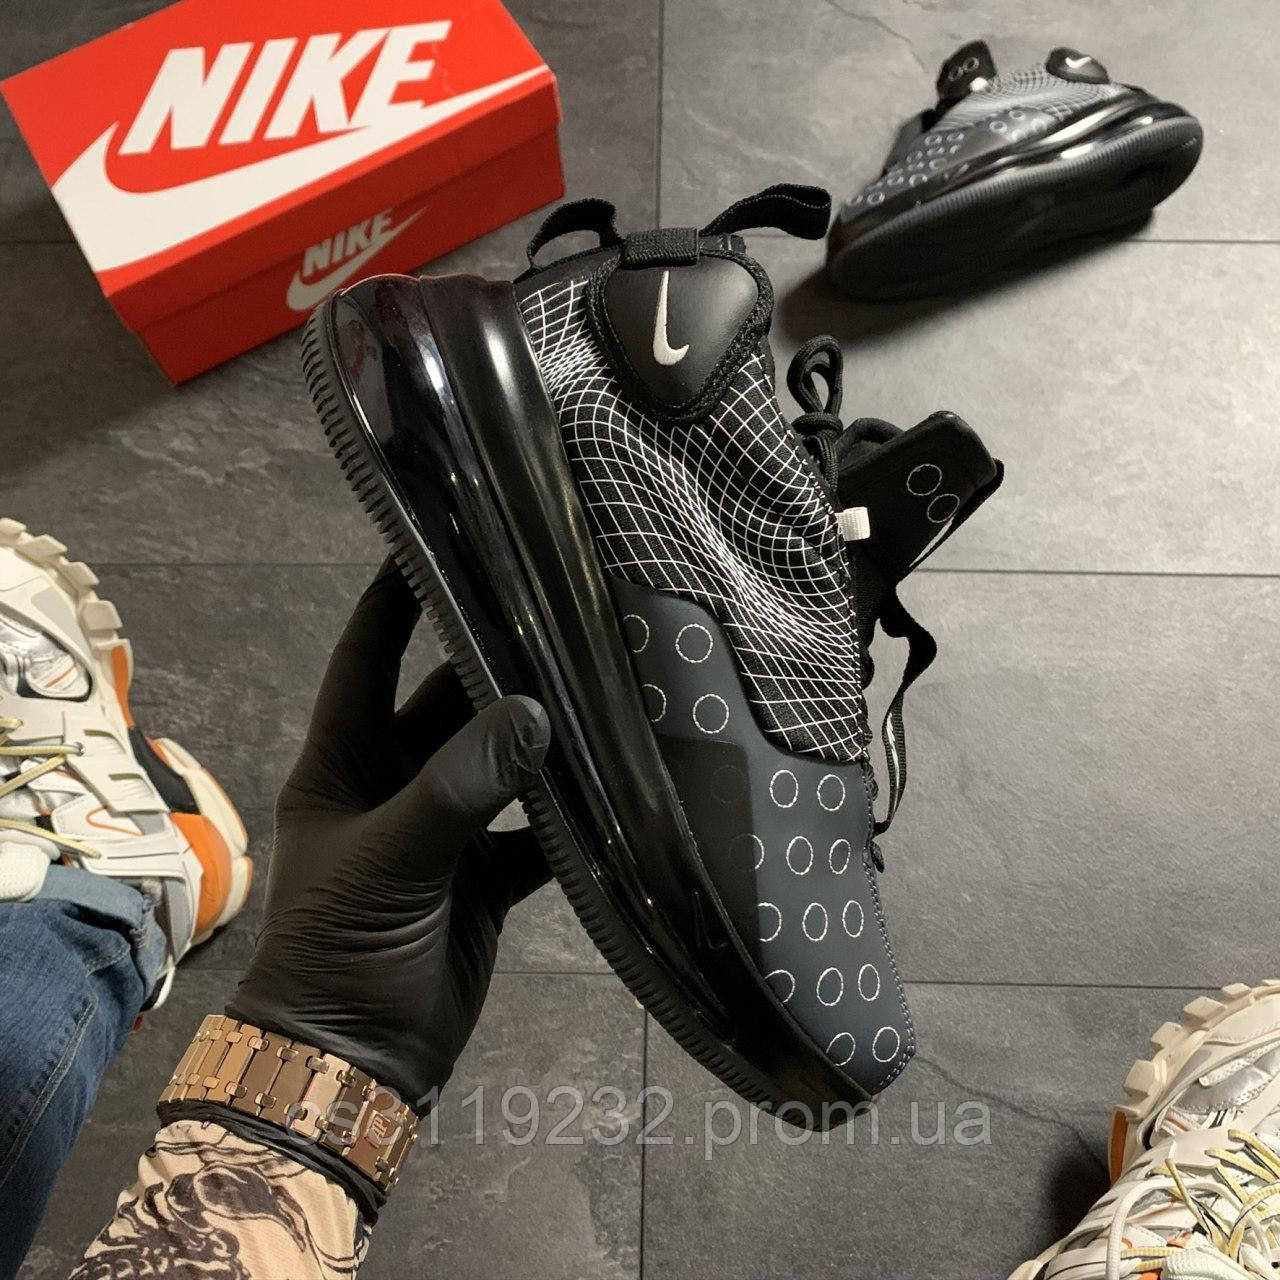 Мужские кроссовки Nike Air Max 720 Sneakerboots Black White (черные)